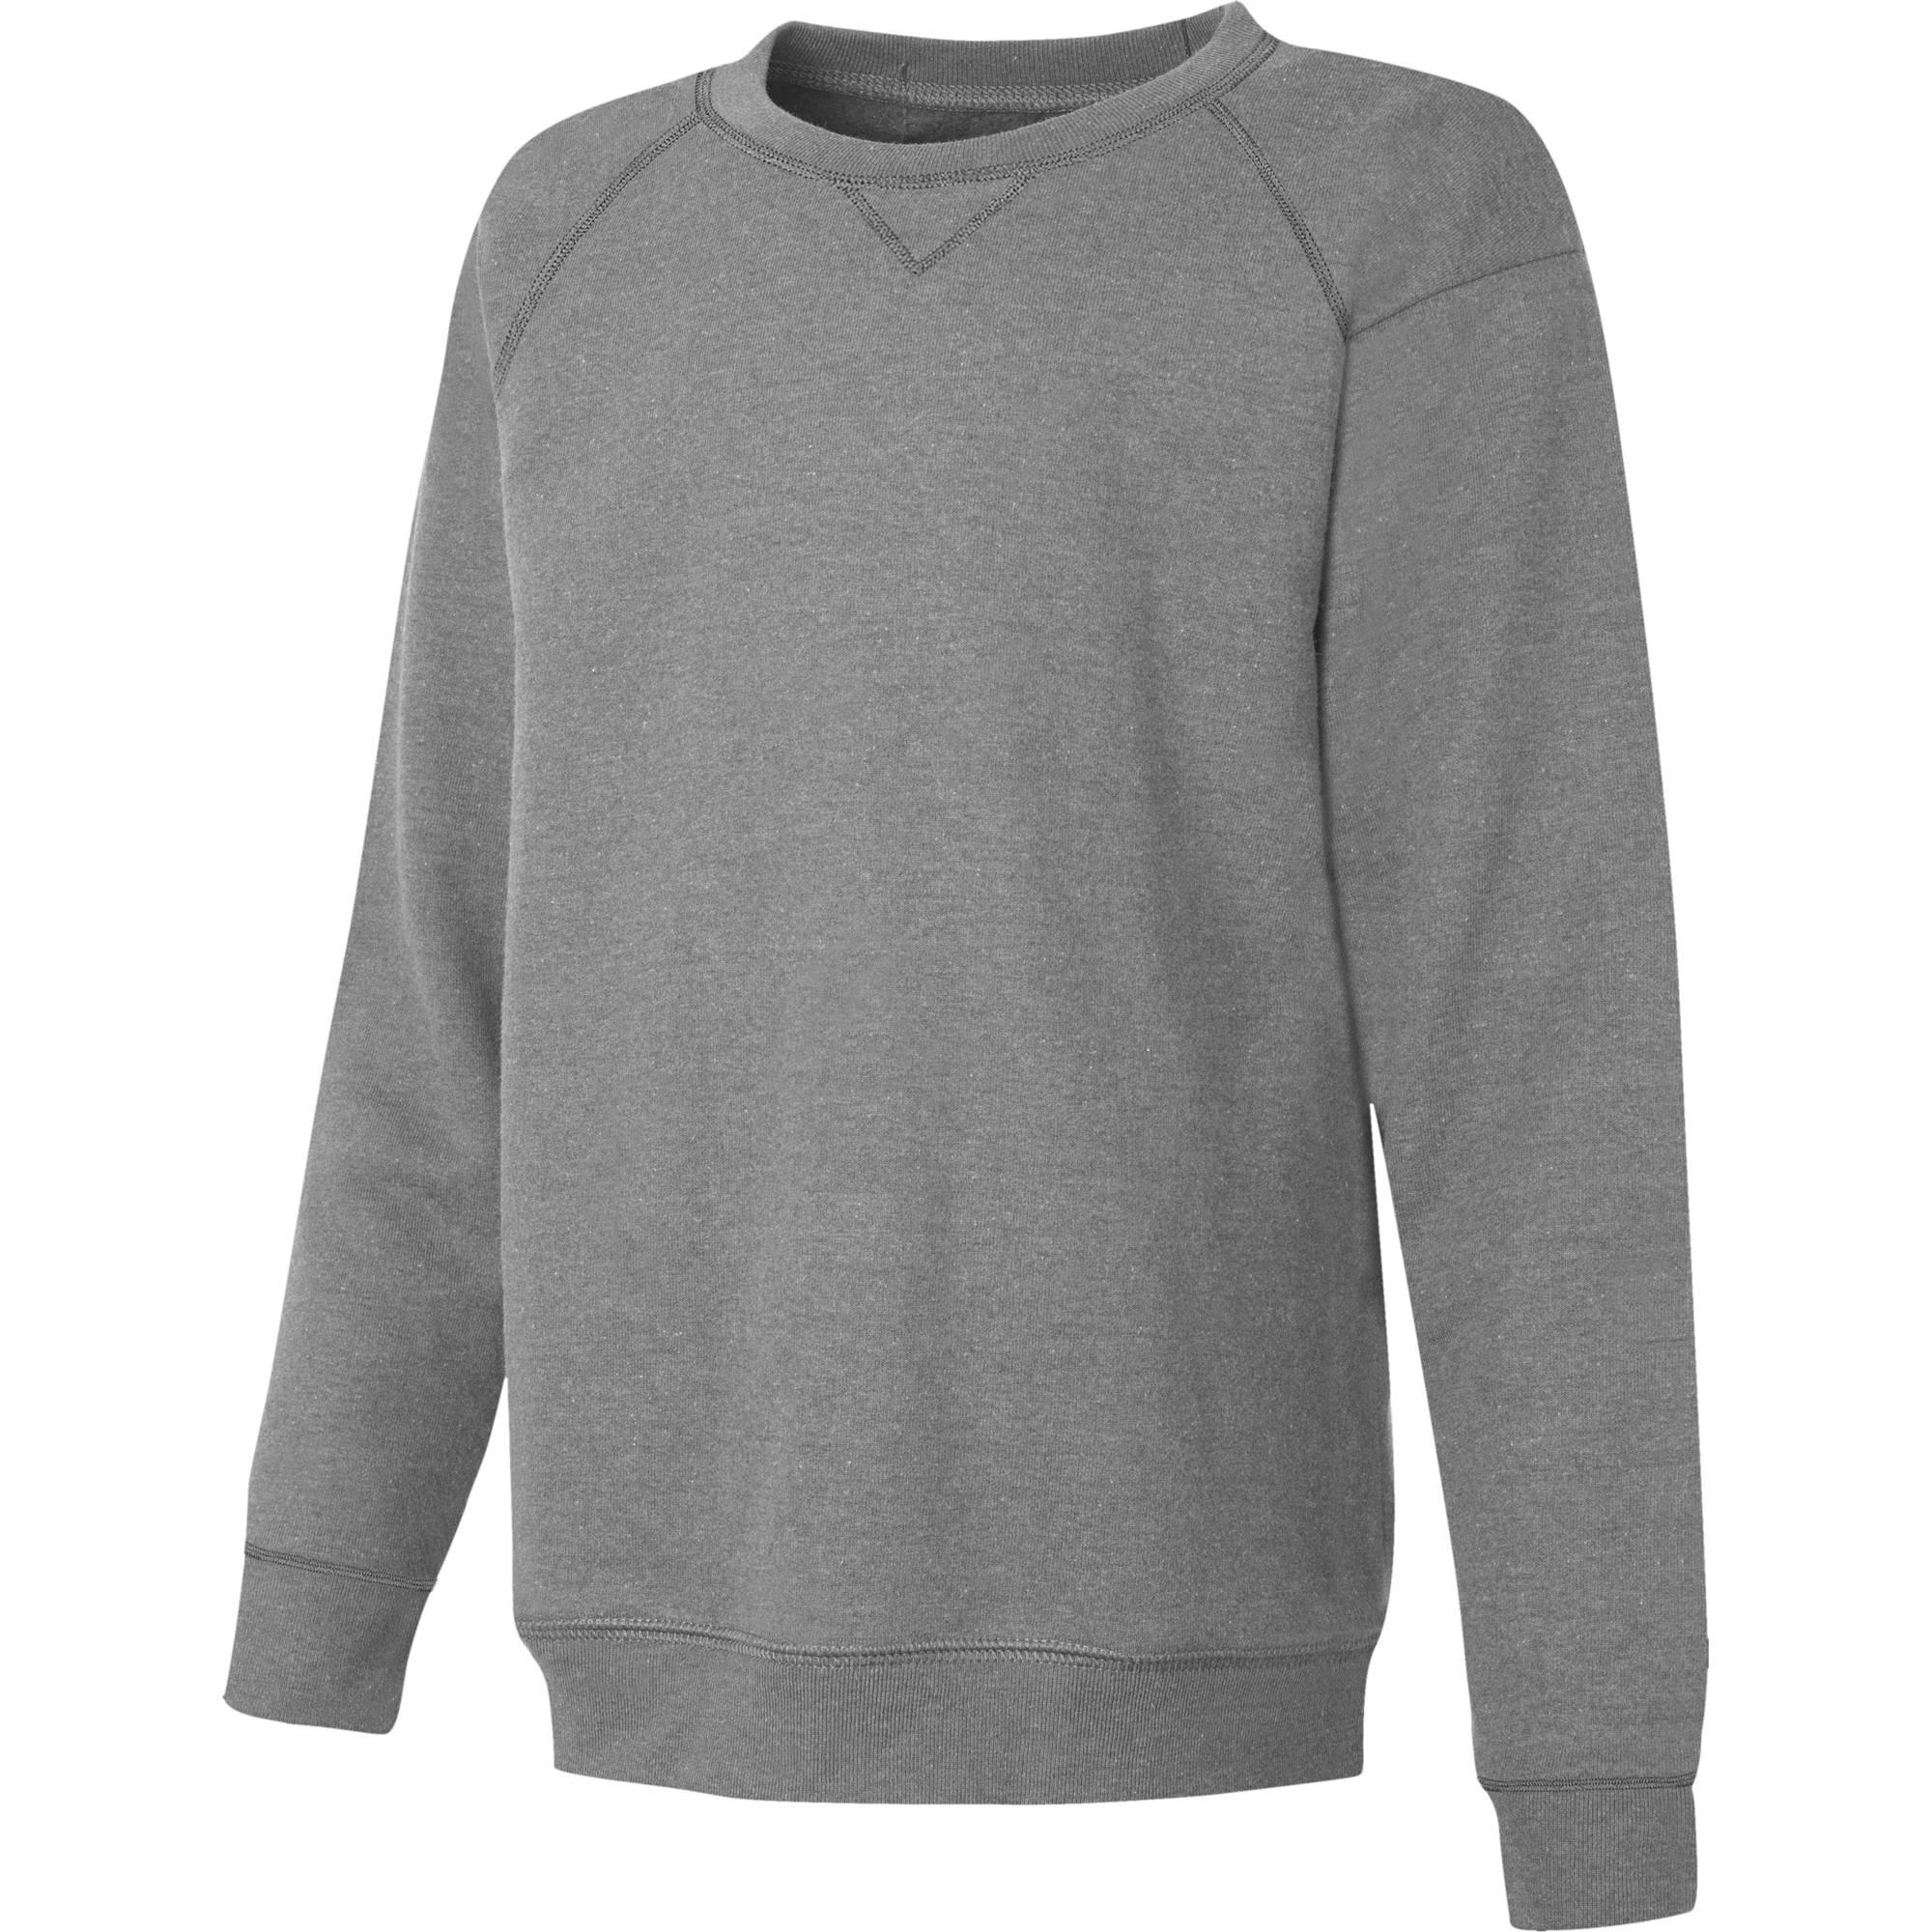 Hanes Boys' Tagless Fleece V-notch Athletic Sweatshirt